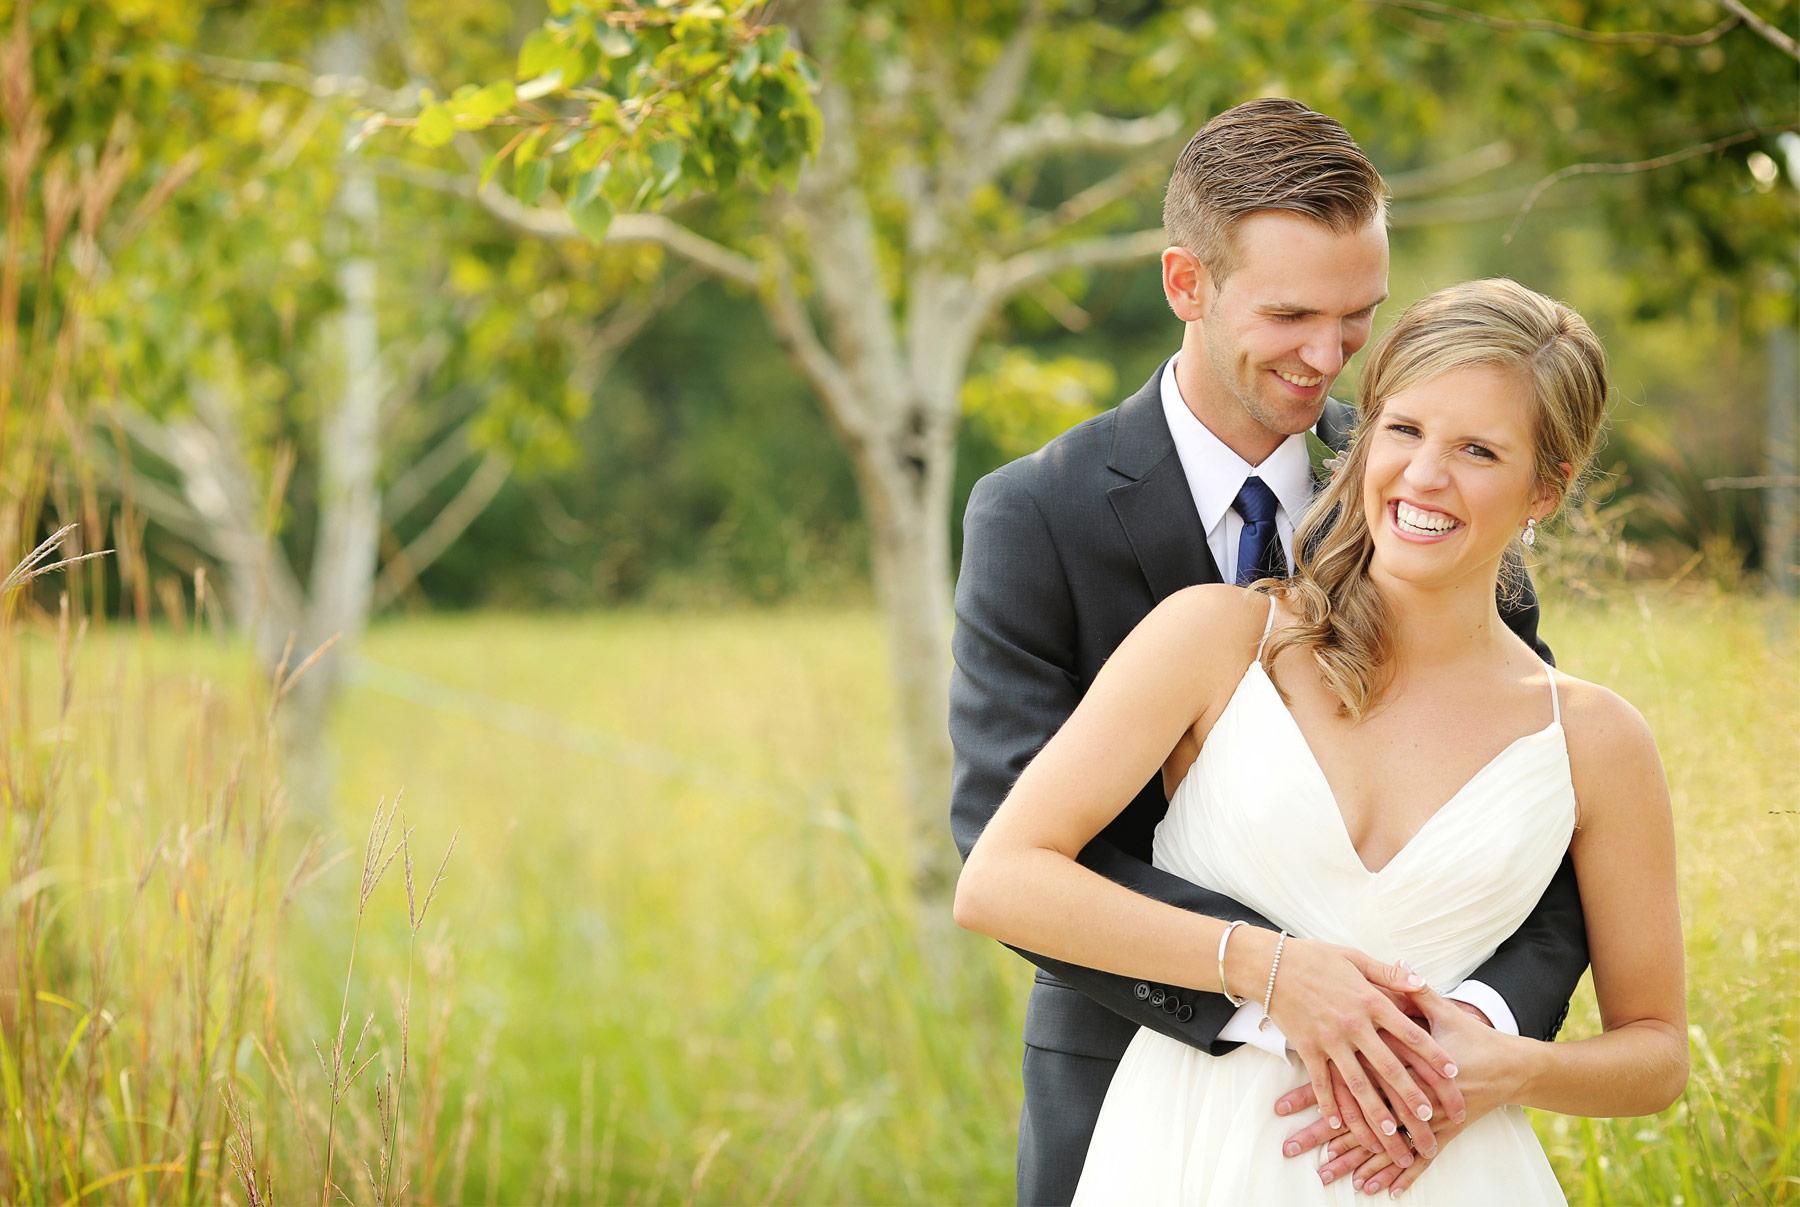 06-Minneapolis-Minnesota-Wedding-Photography-by-Vick-Photography-Field-First-Look-Jess-&-Jake.jpg